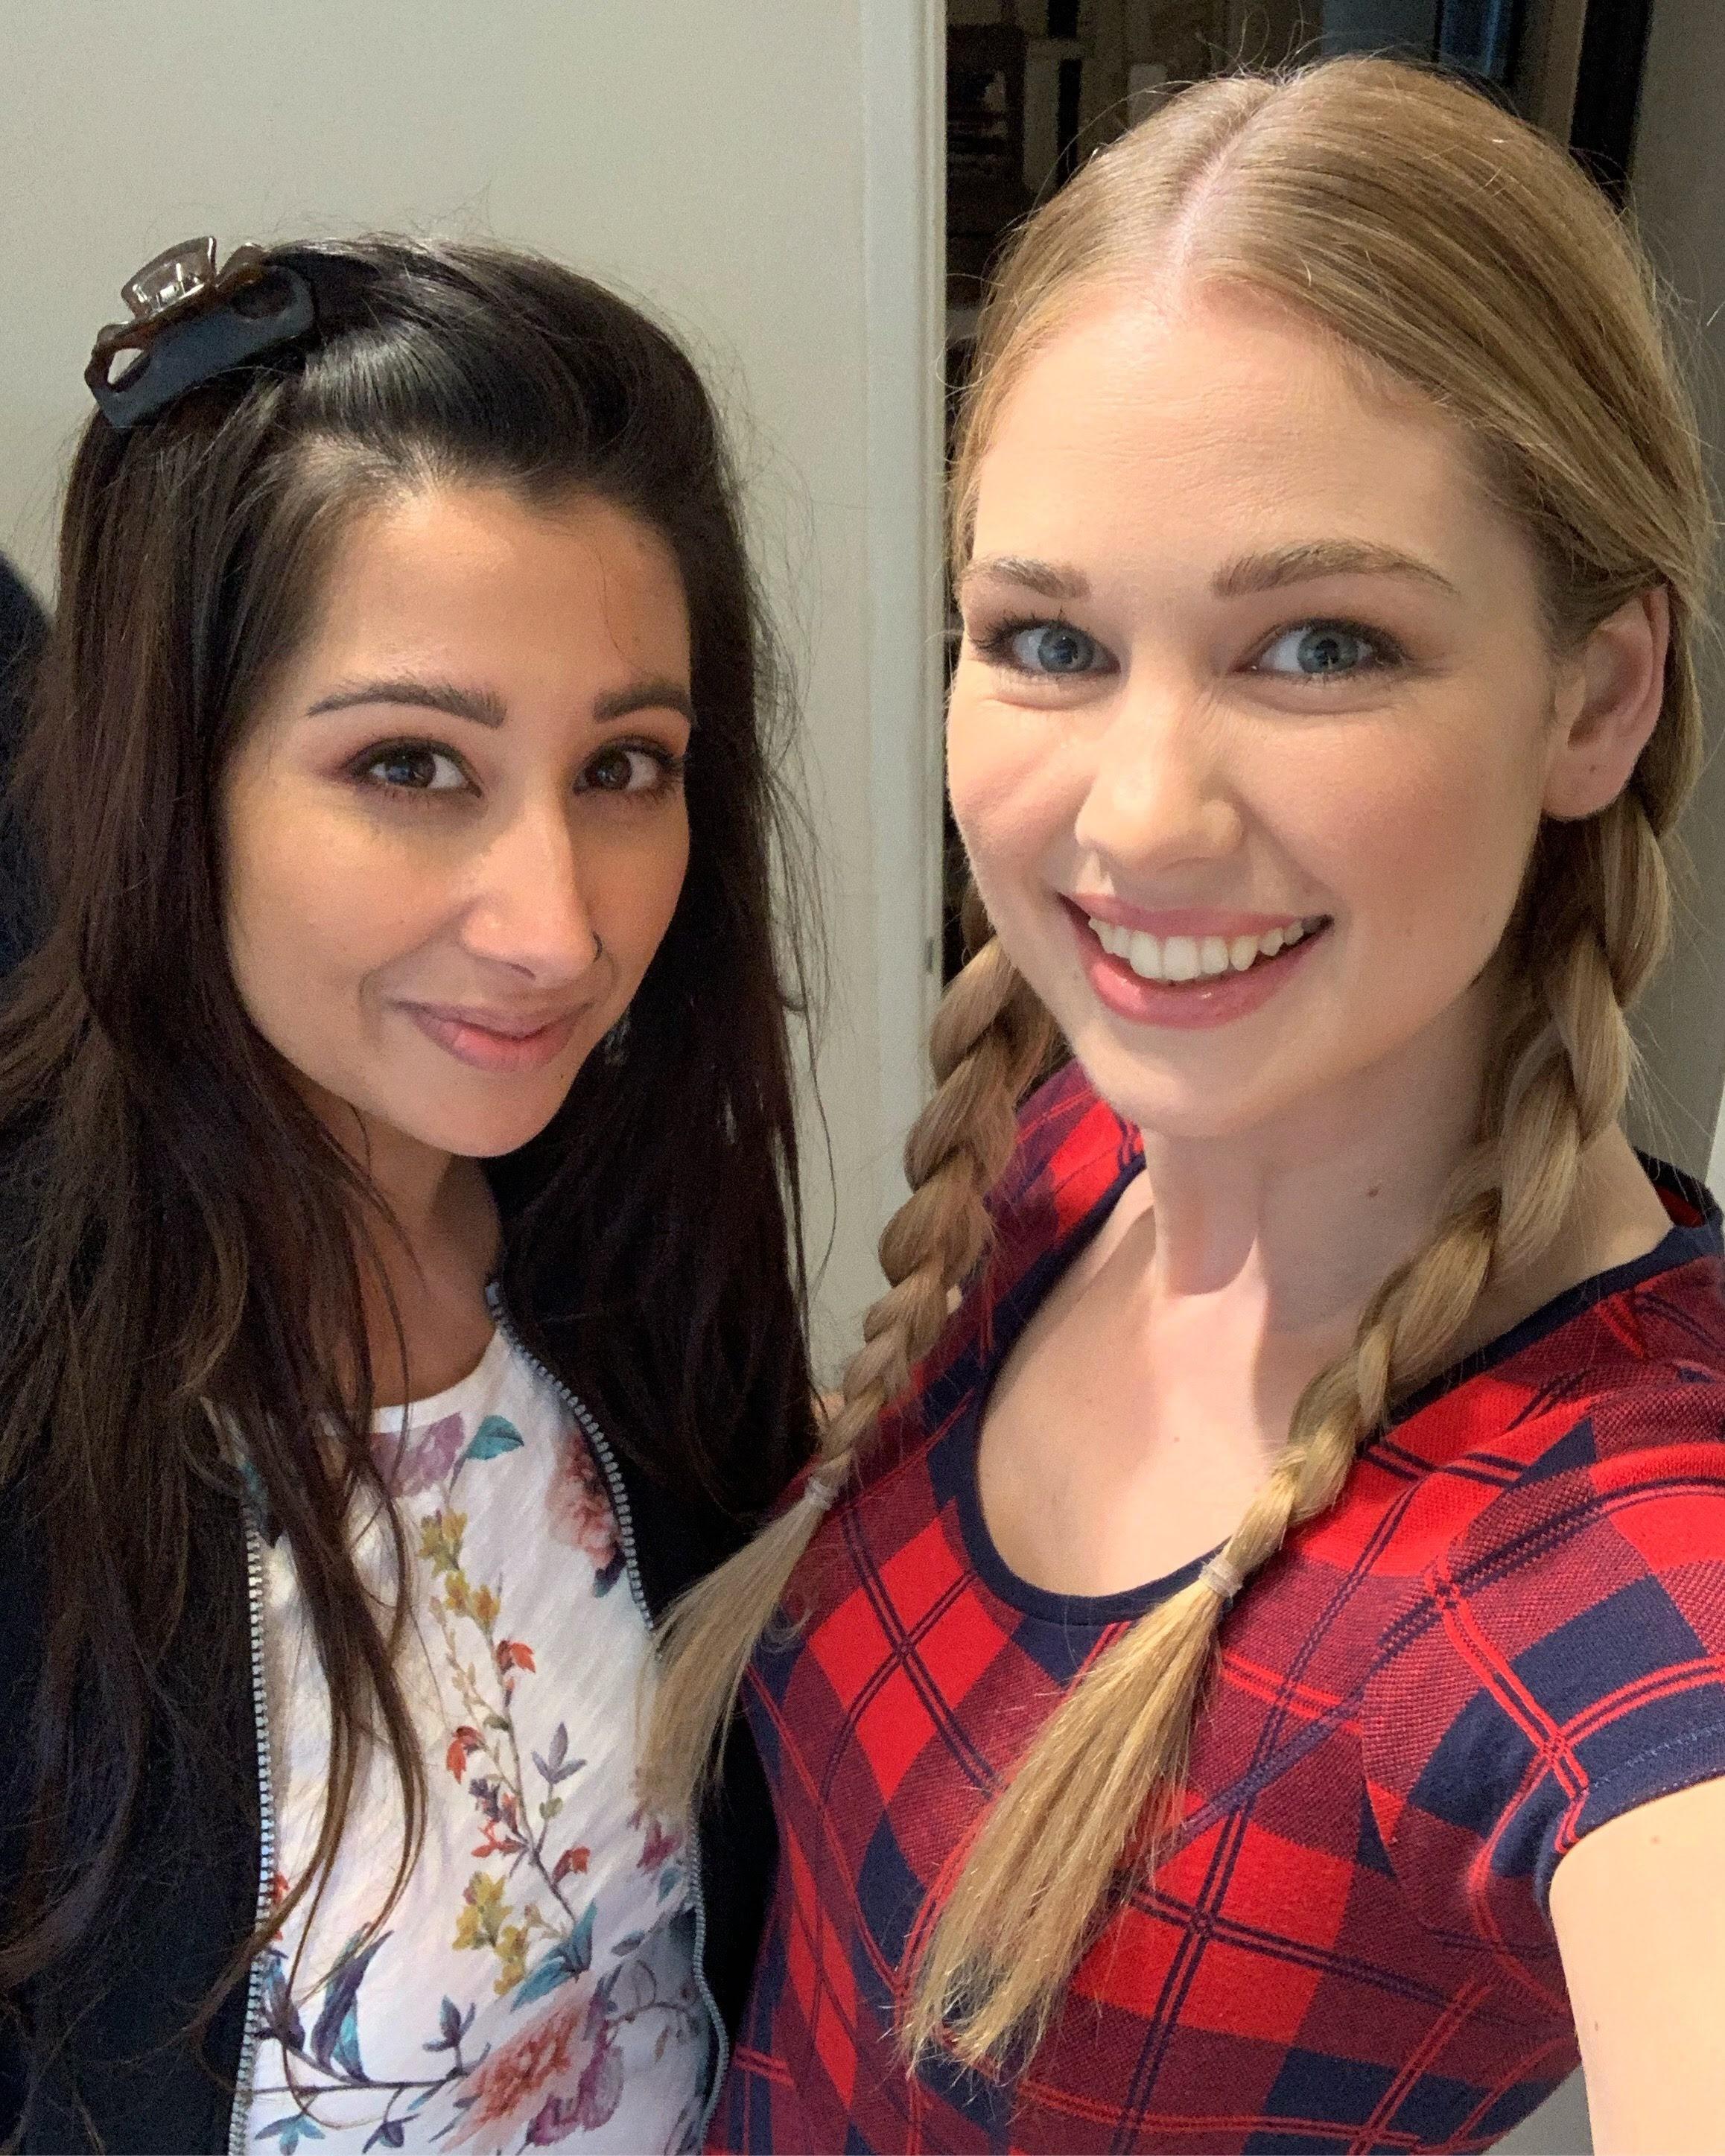 Amanda Clapham hair and makeup